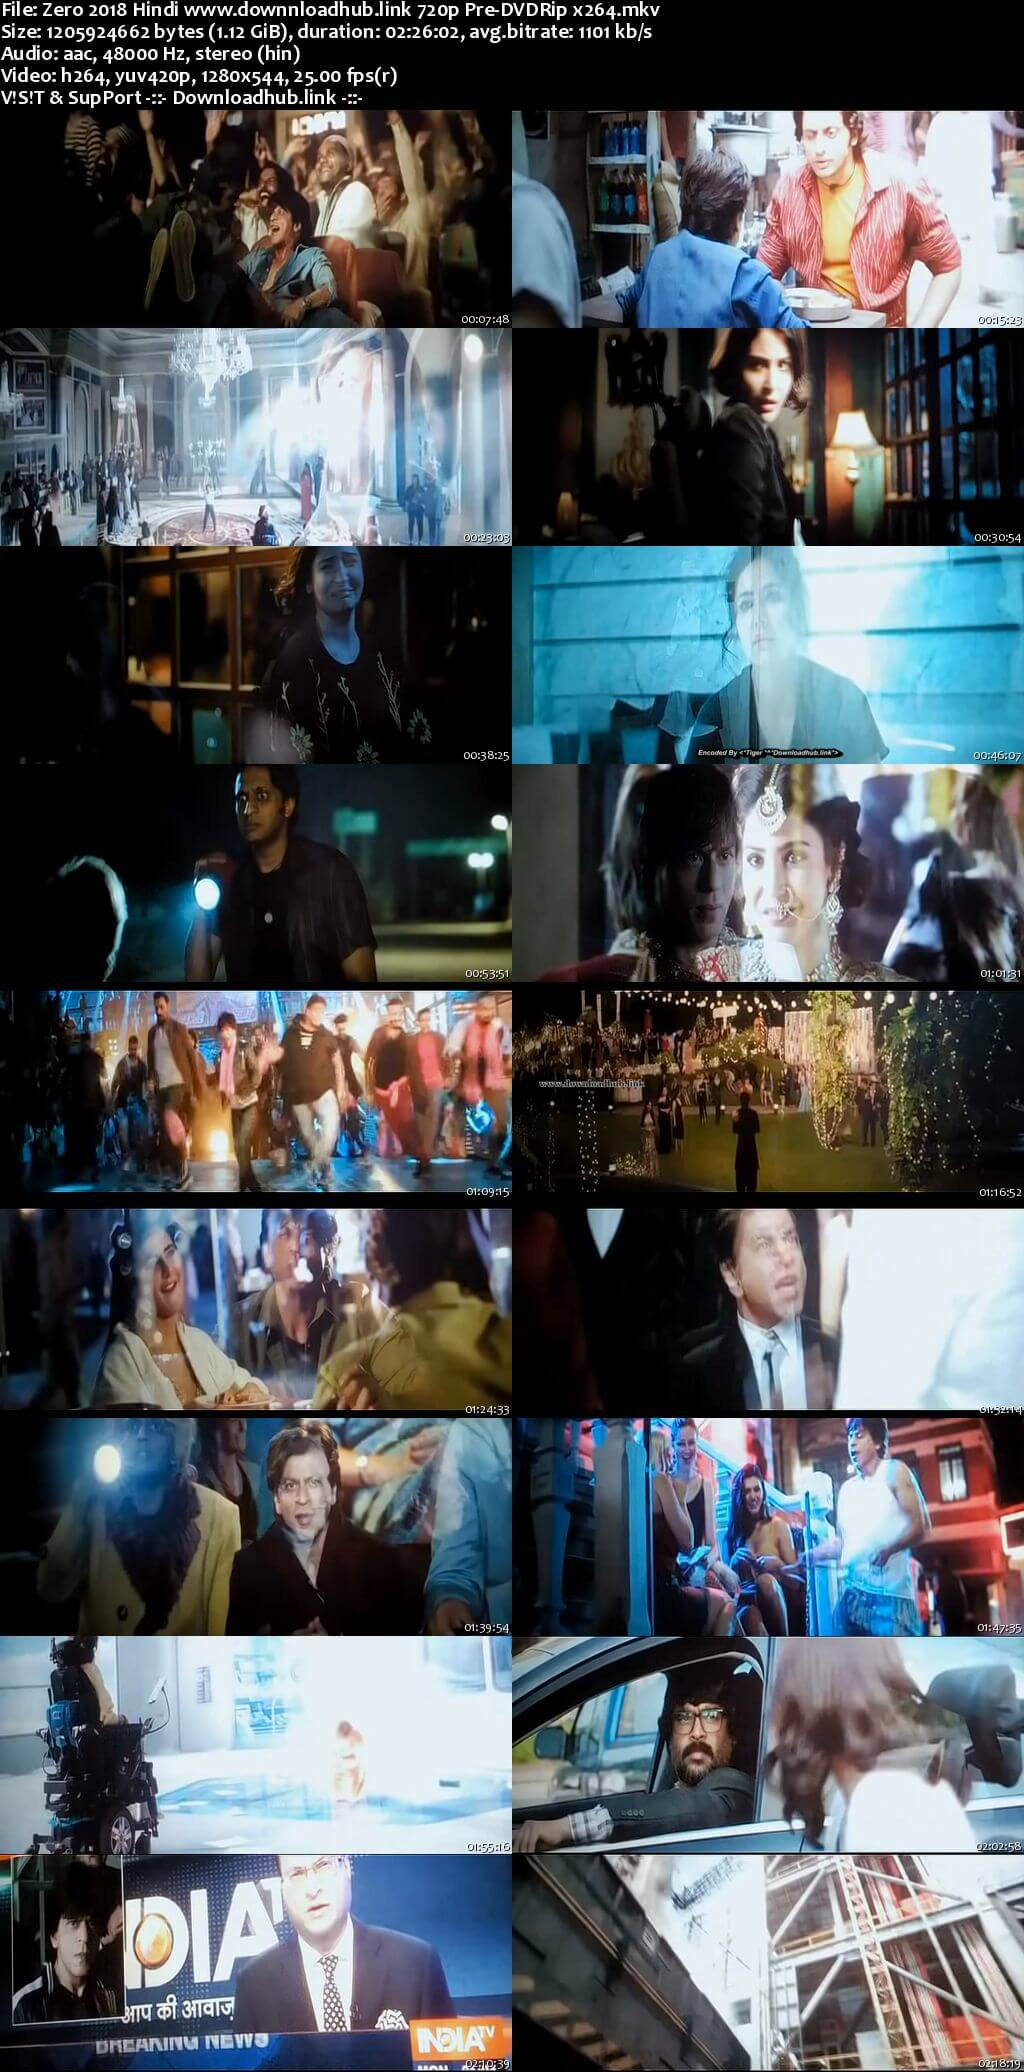 Zero 2018 Hindi 720p Pre-DVDRip x264